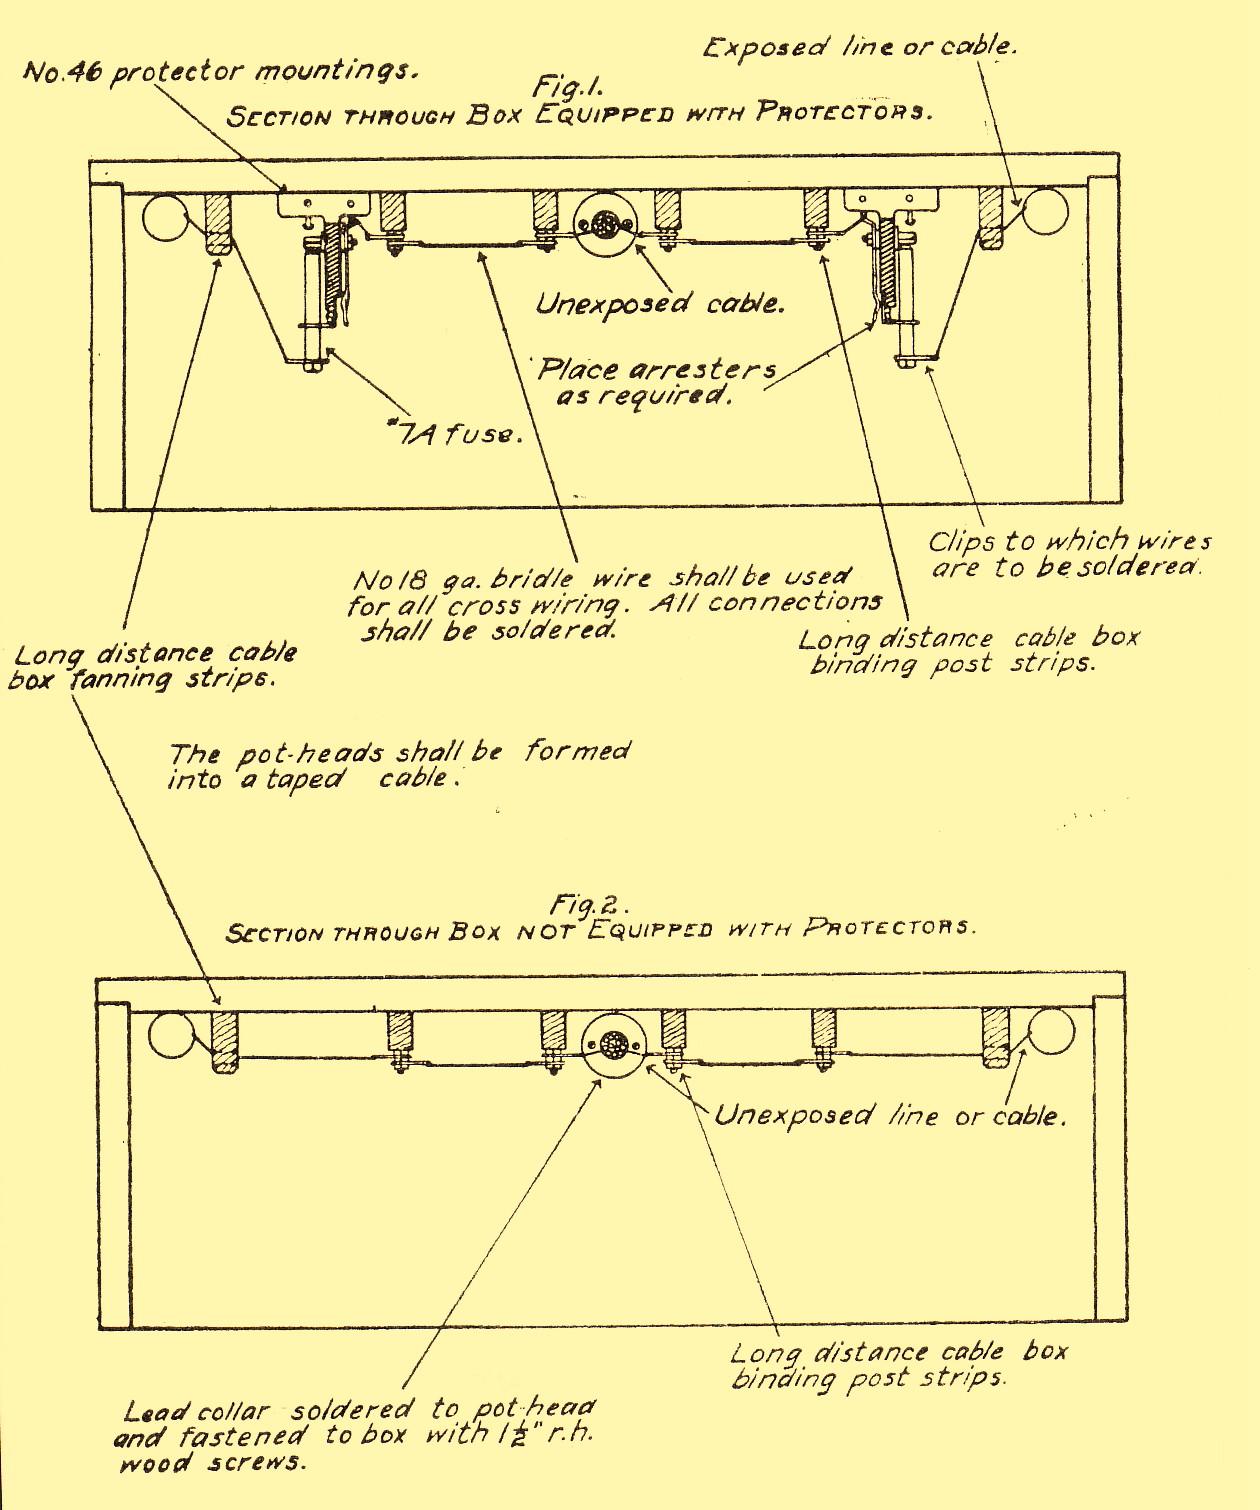 medium resolution of distributing box interior profile of equipment placement